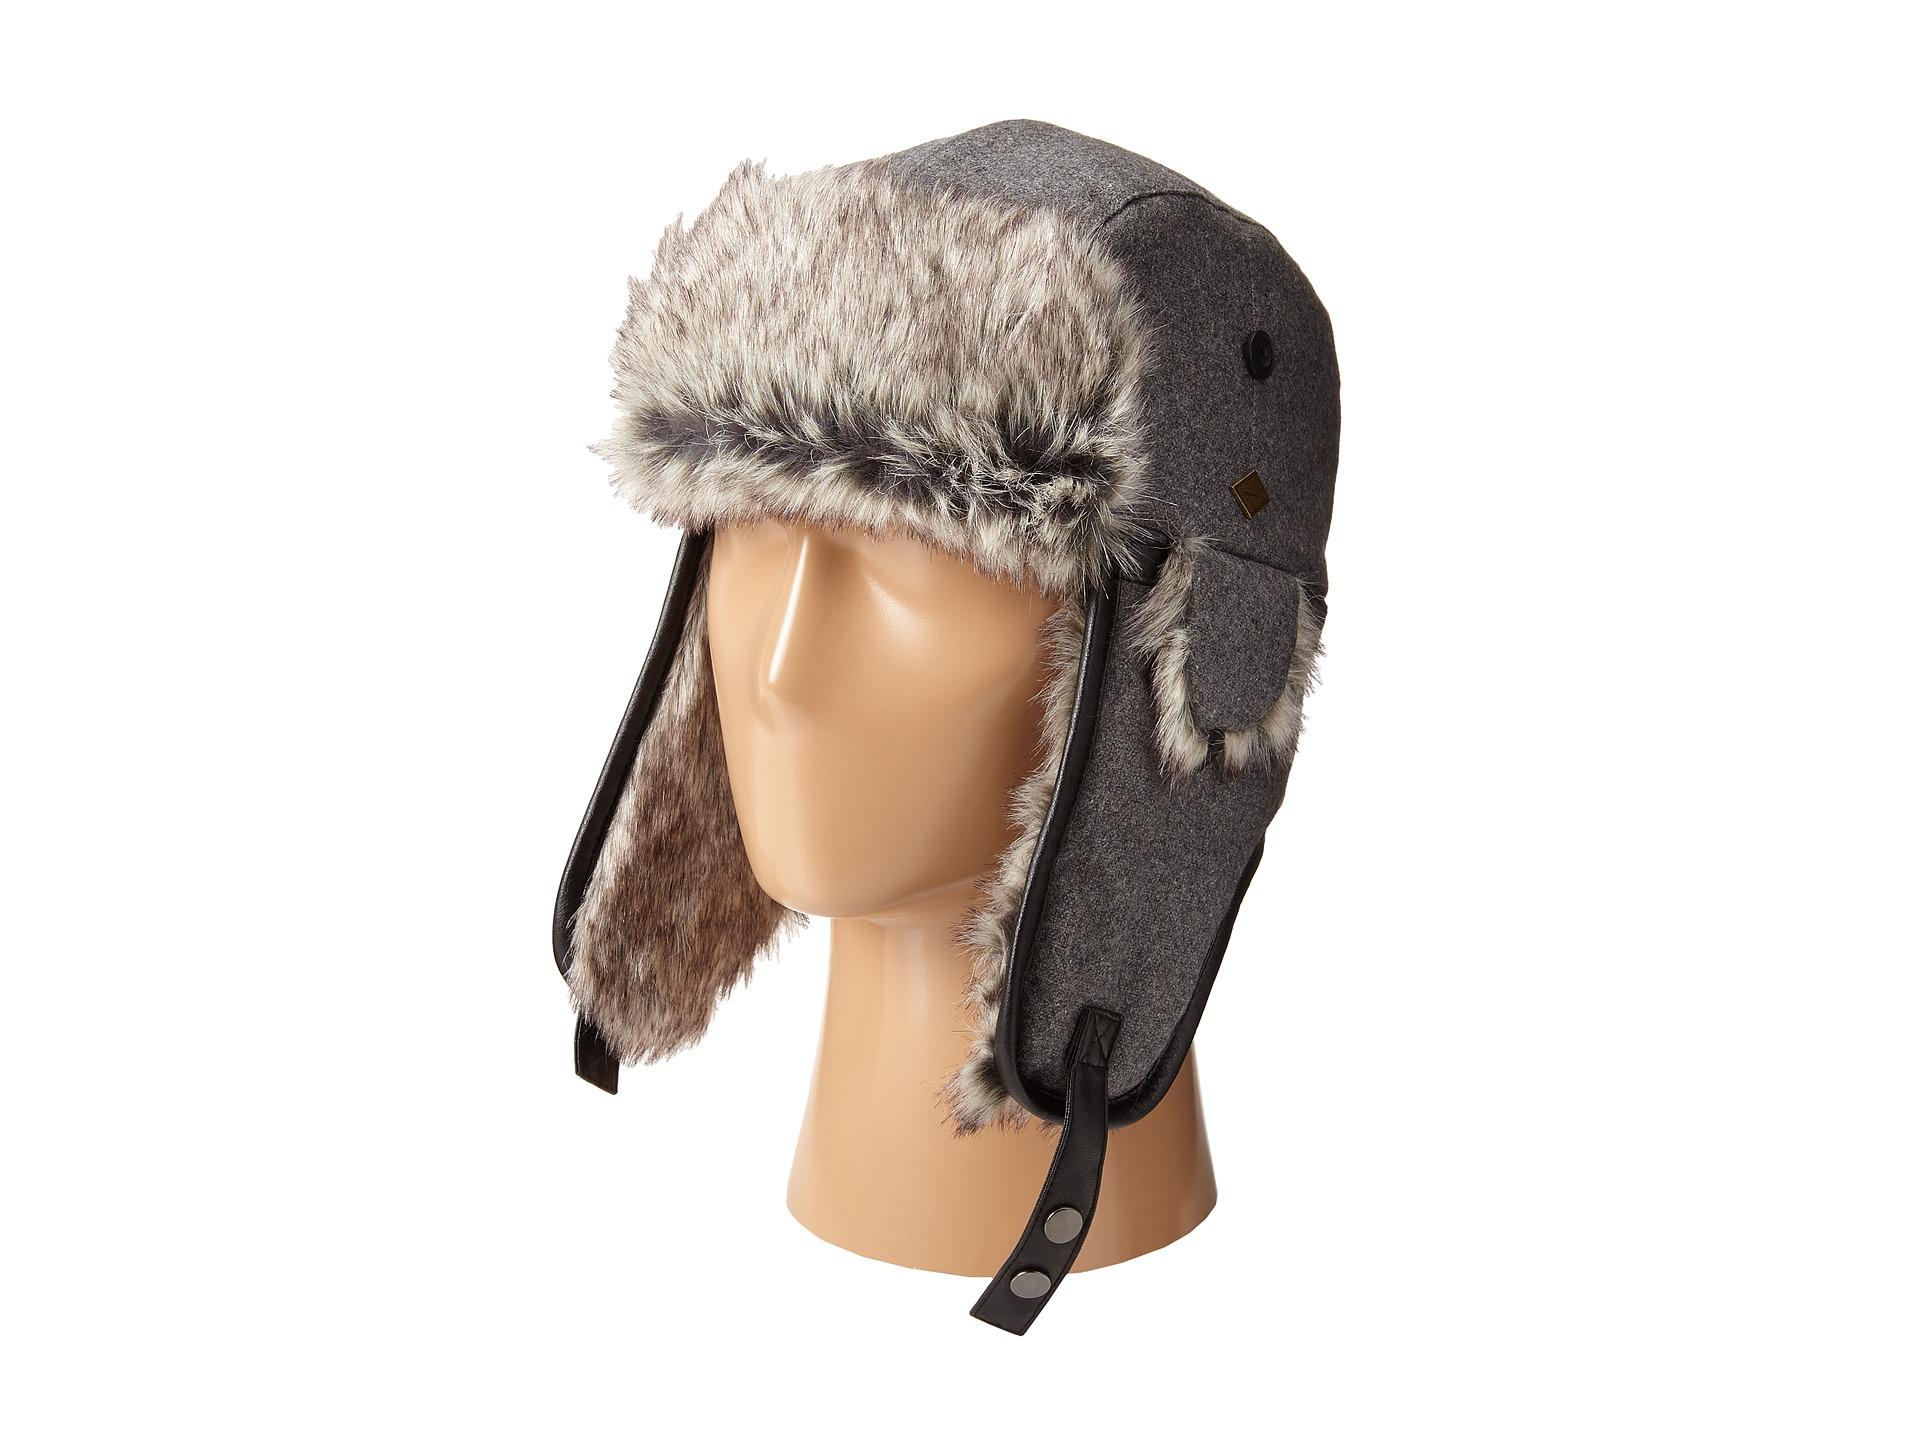 a35a5953c8760 Lyst - San Diego Hat Company Sdh2067 Faux Fur Trapper With Faux ...